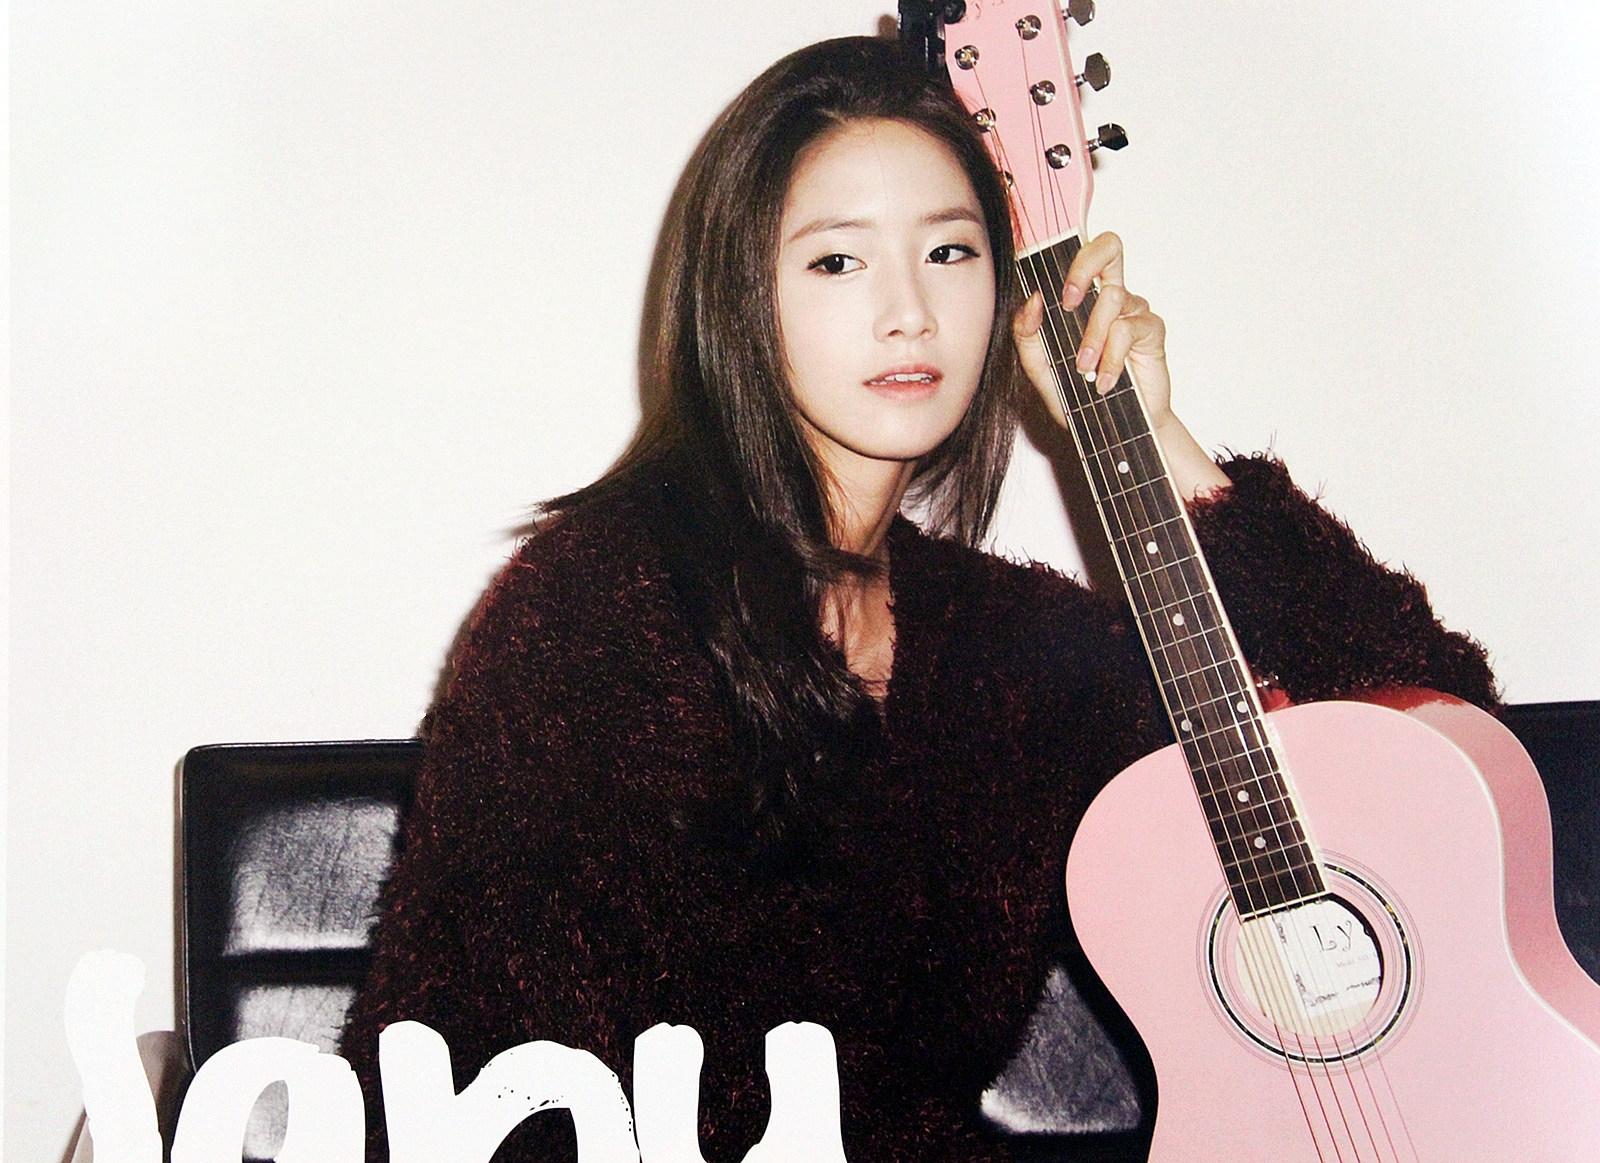 yoona dating jonghyun